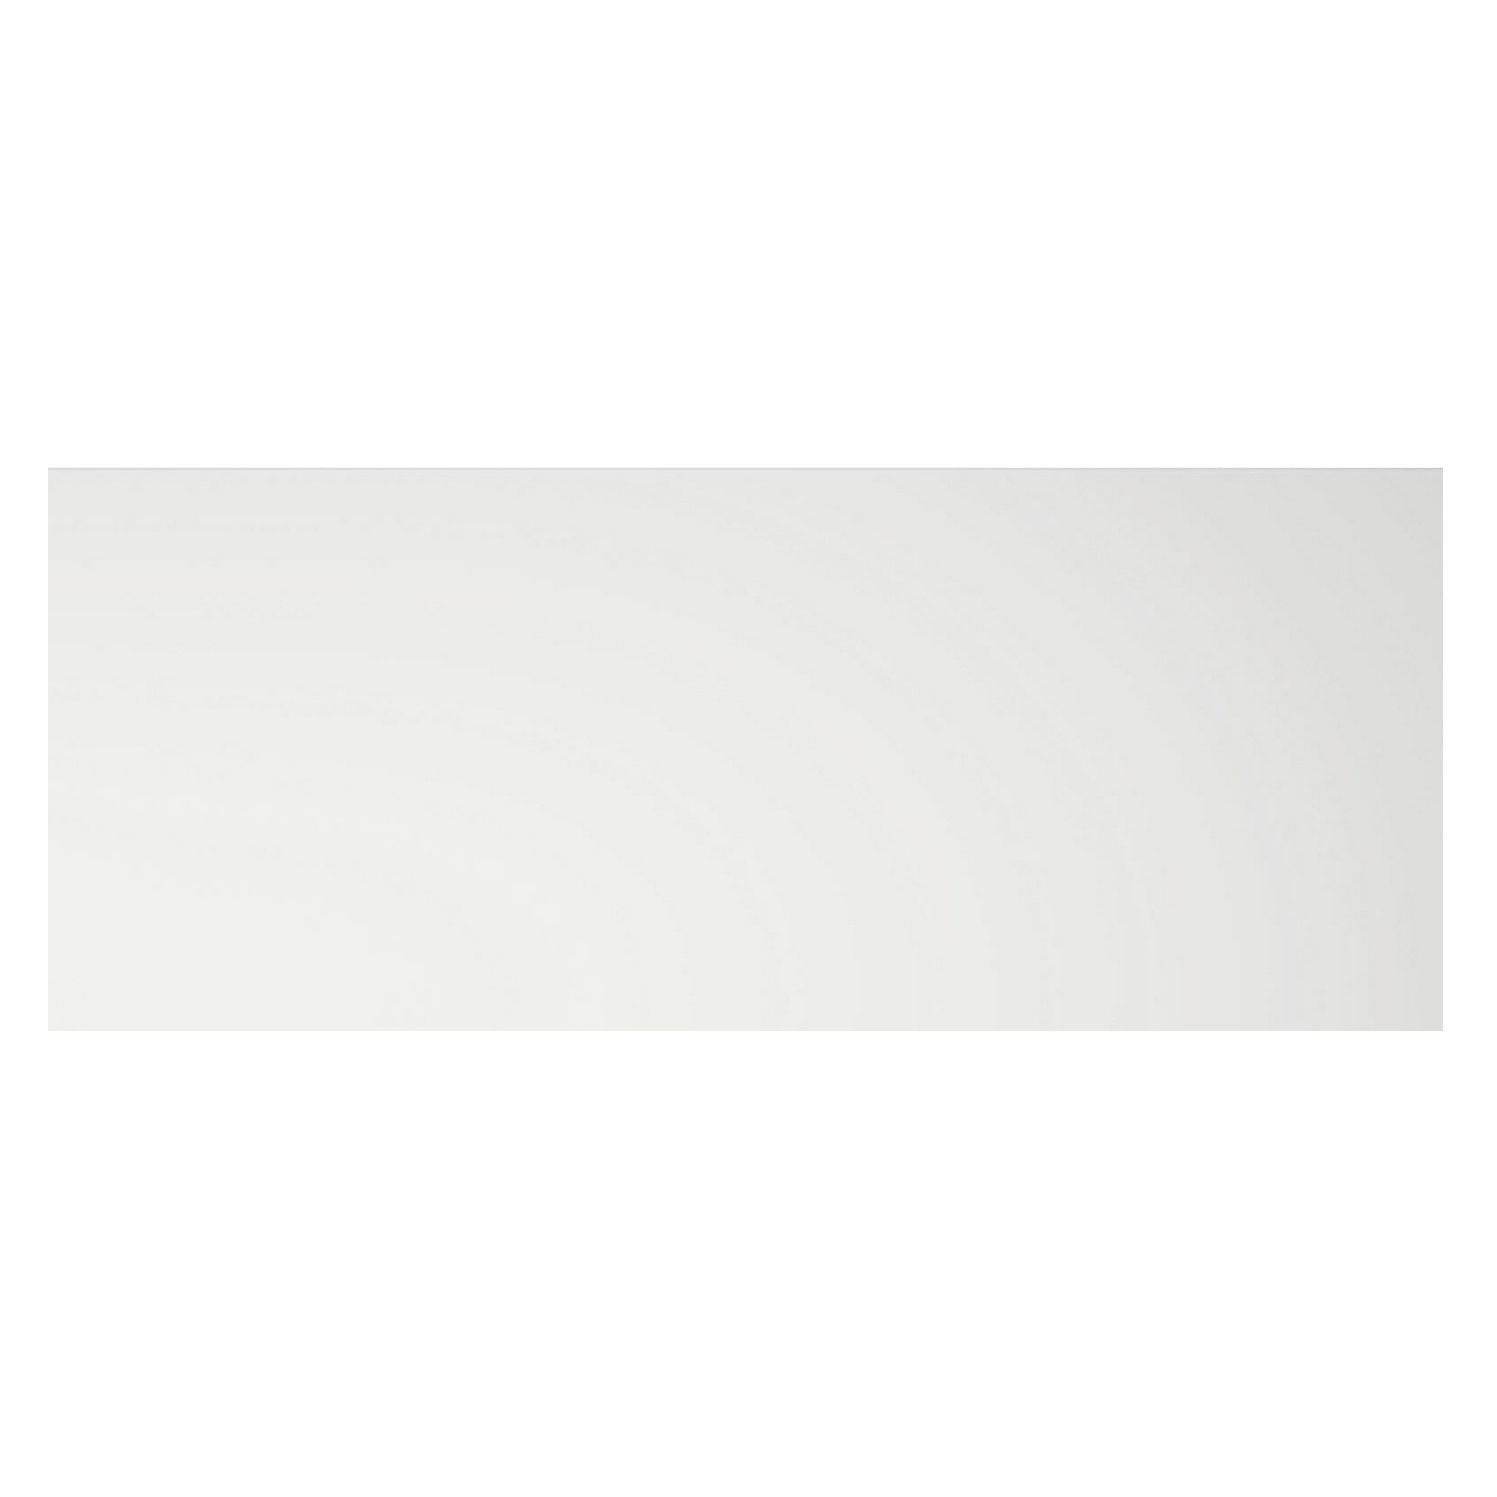 Cooke & Lewis Appleby High Gloss White Pan Drawer Front / Bi-fold Door (w)800mm